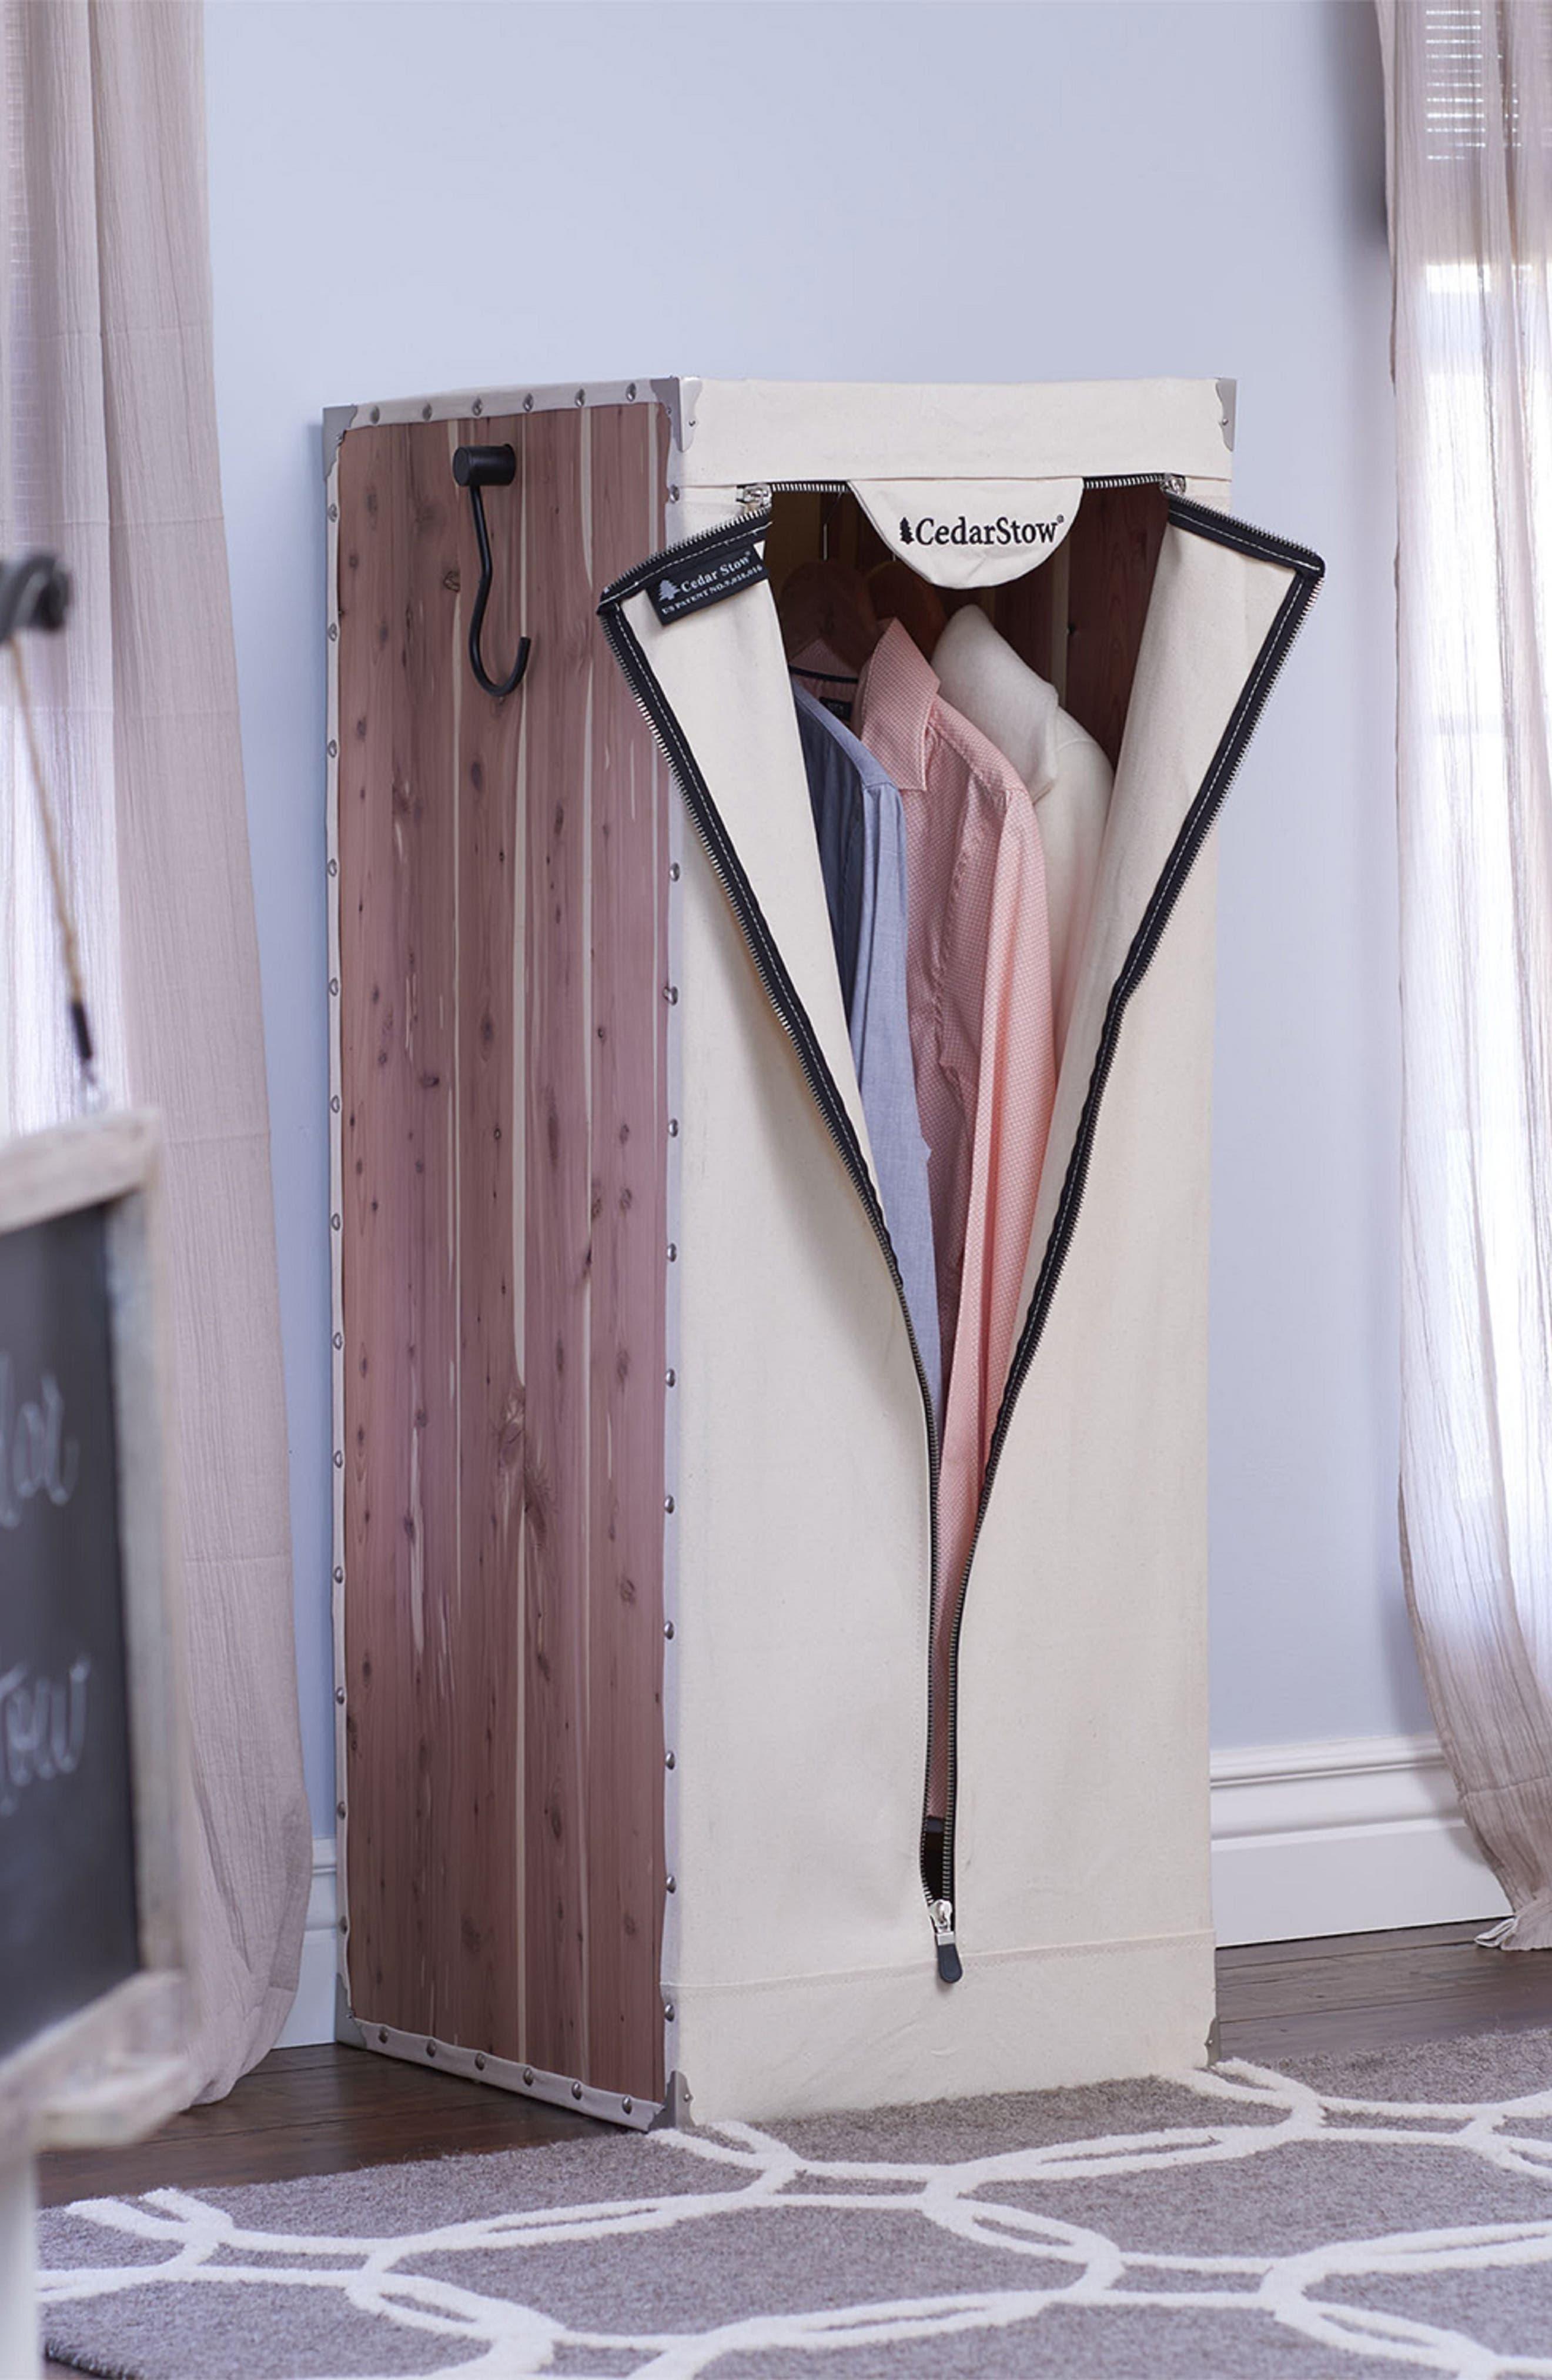 CedarStow Clothing Wardrobe,                             Alternate thumbnail 7, color,                             BEIGE AND CEDAR